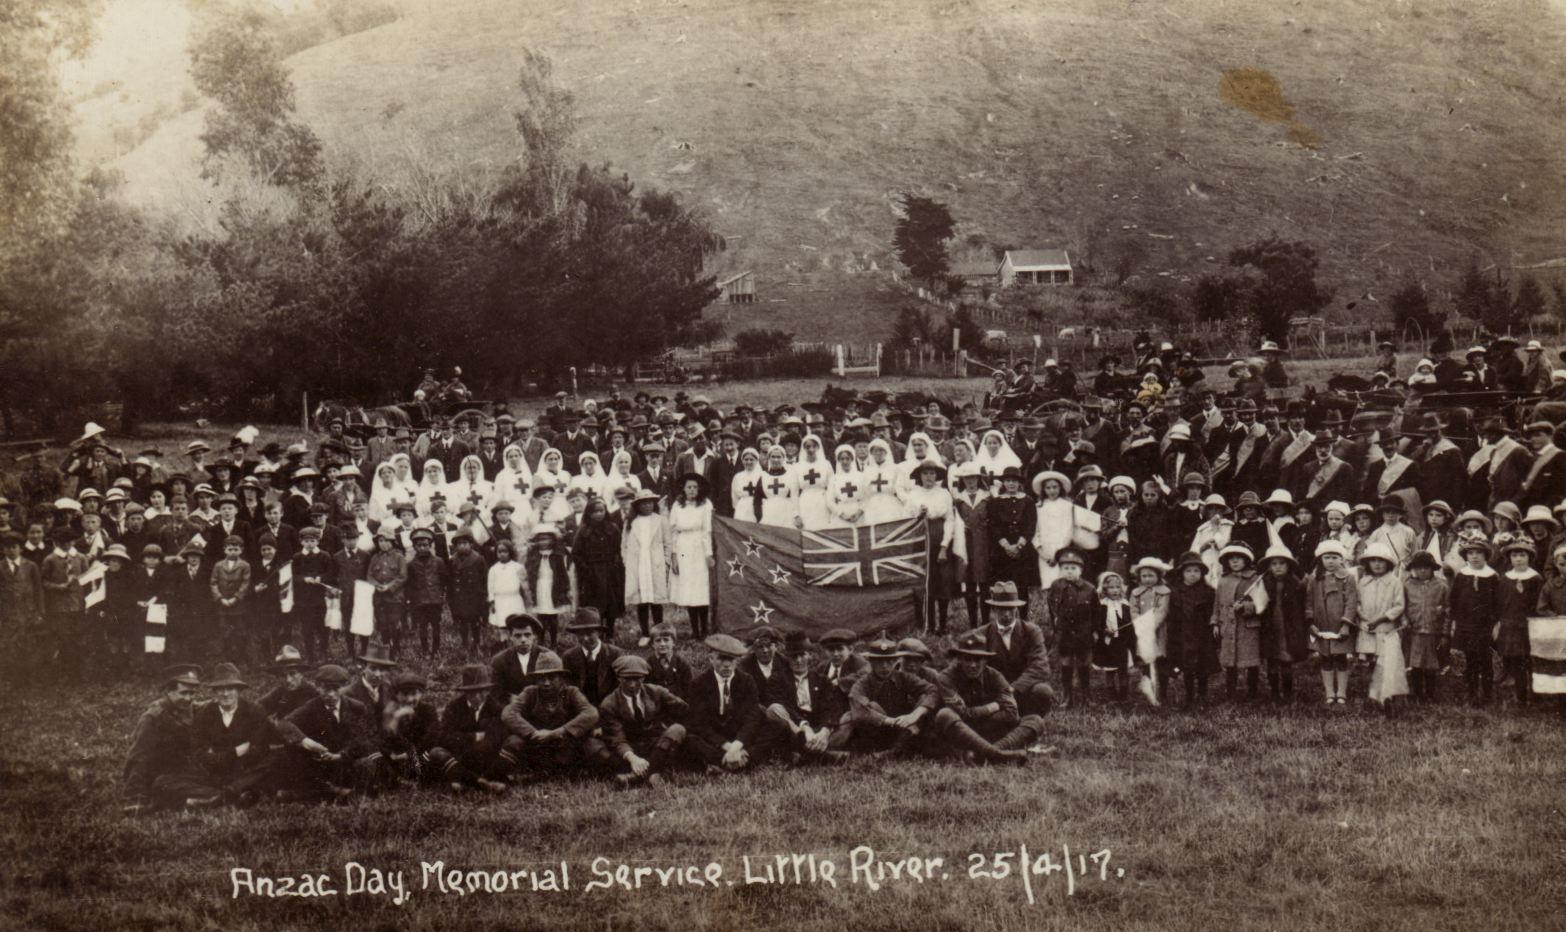 Anzac Day Memorial Service, Little River, 25 April 1917. Source: canterbury100.org.nz